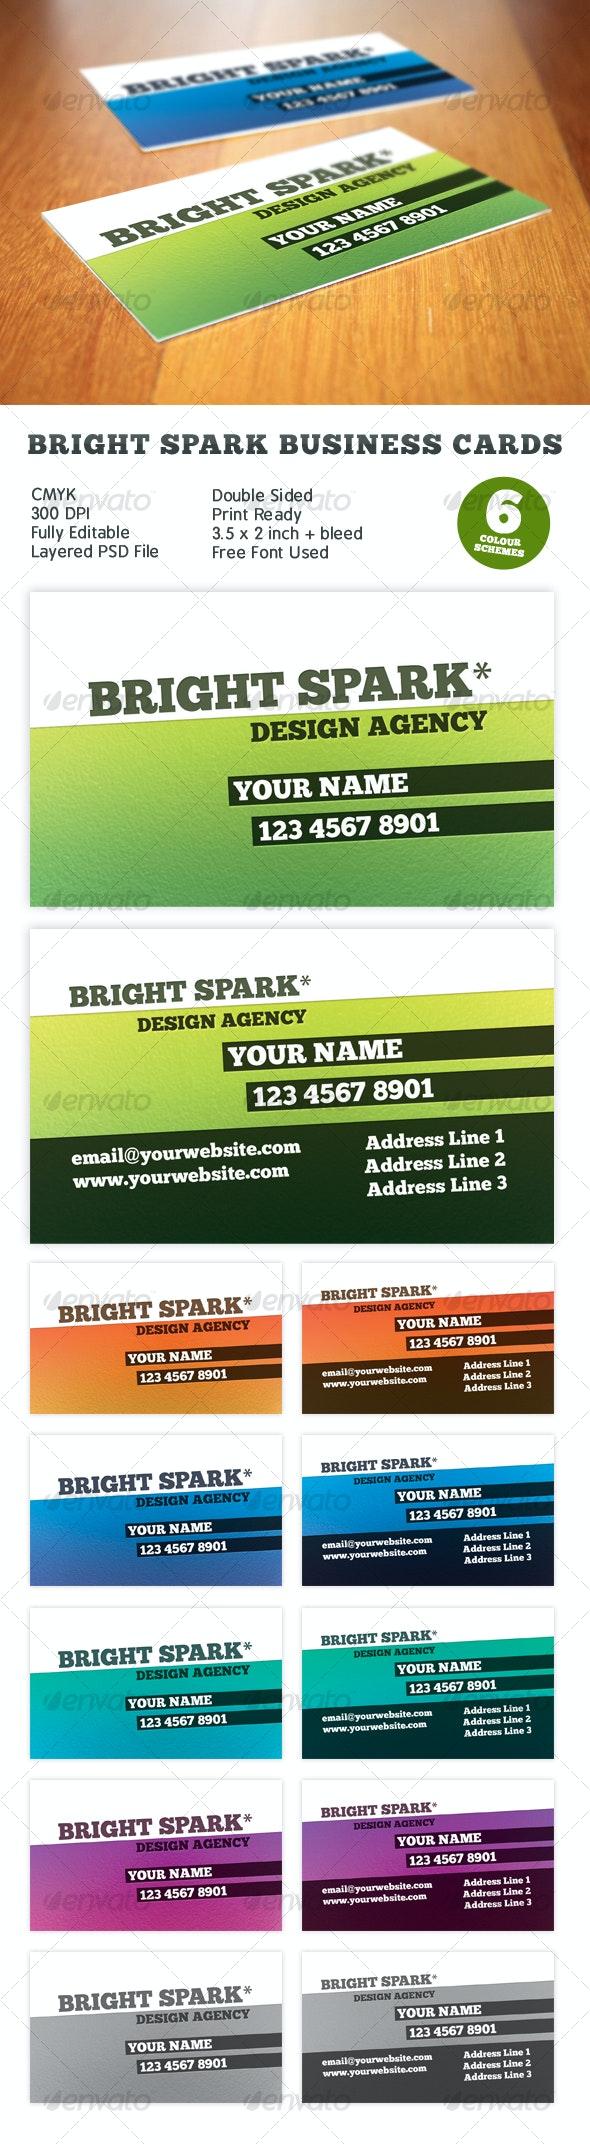 Bright Spark Print Ready Business Card - Creative Business Cards